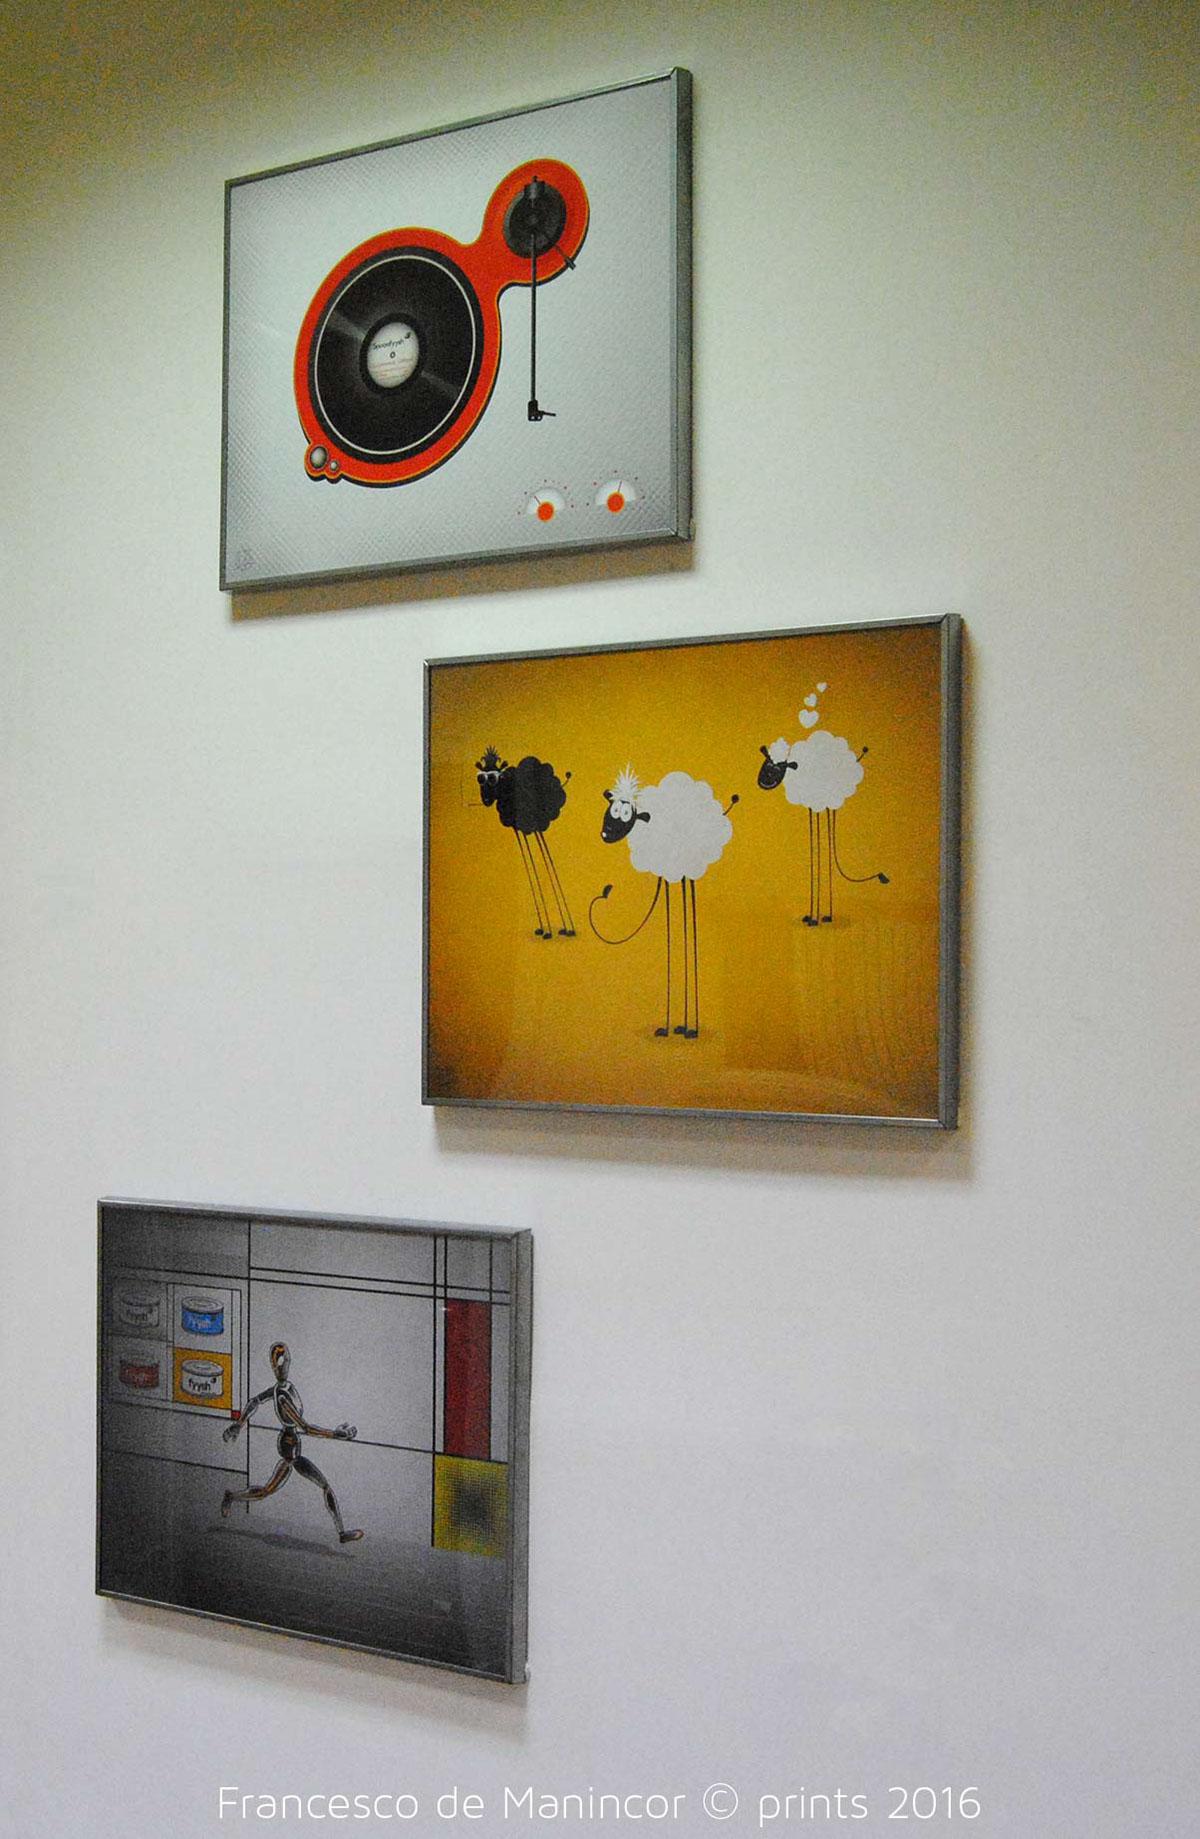 Francesco de Manincor, 2016 prints